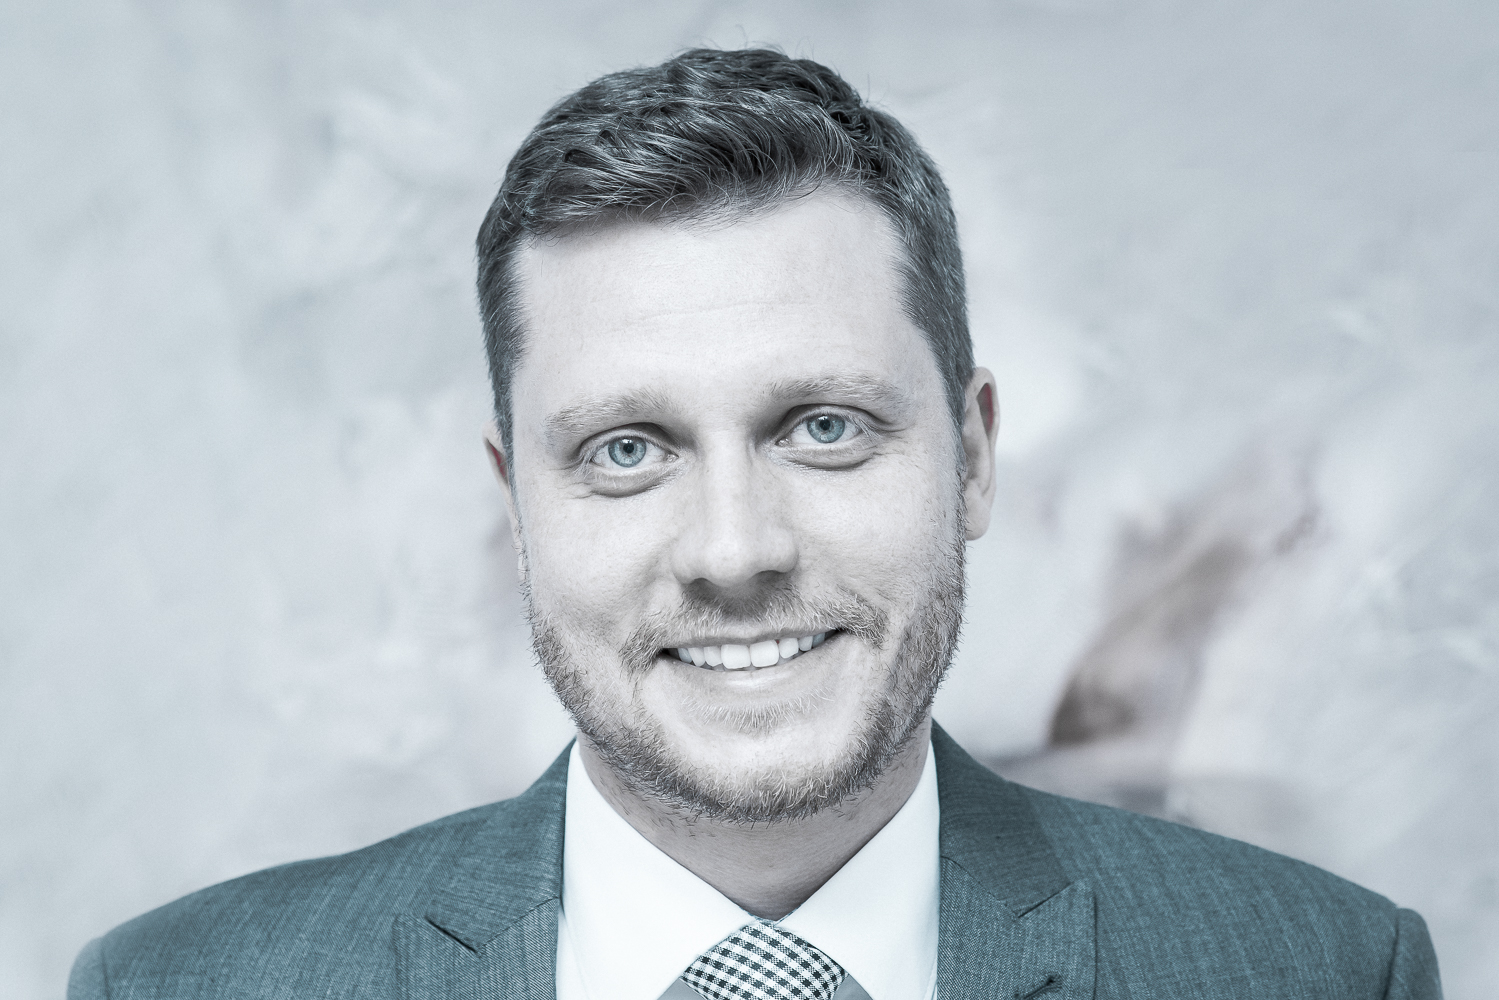 Lawyer Rudi Wall